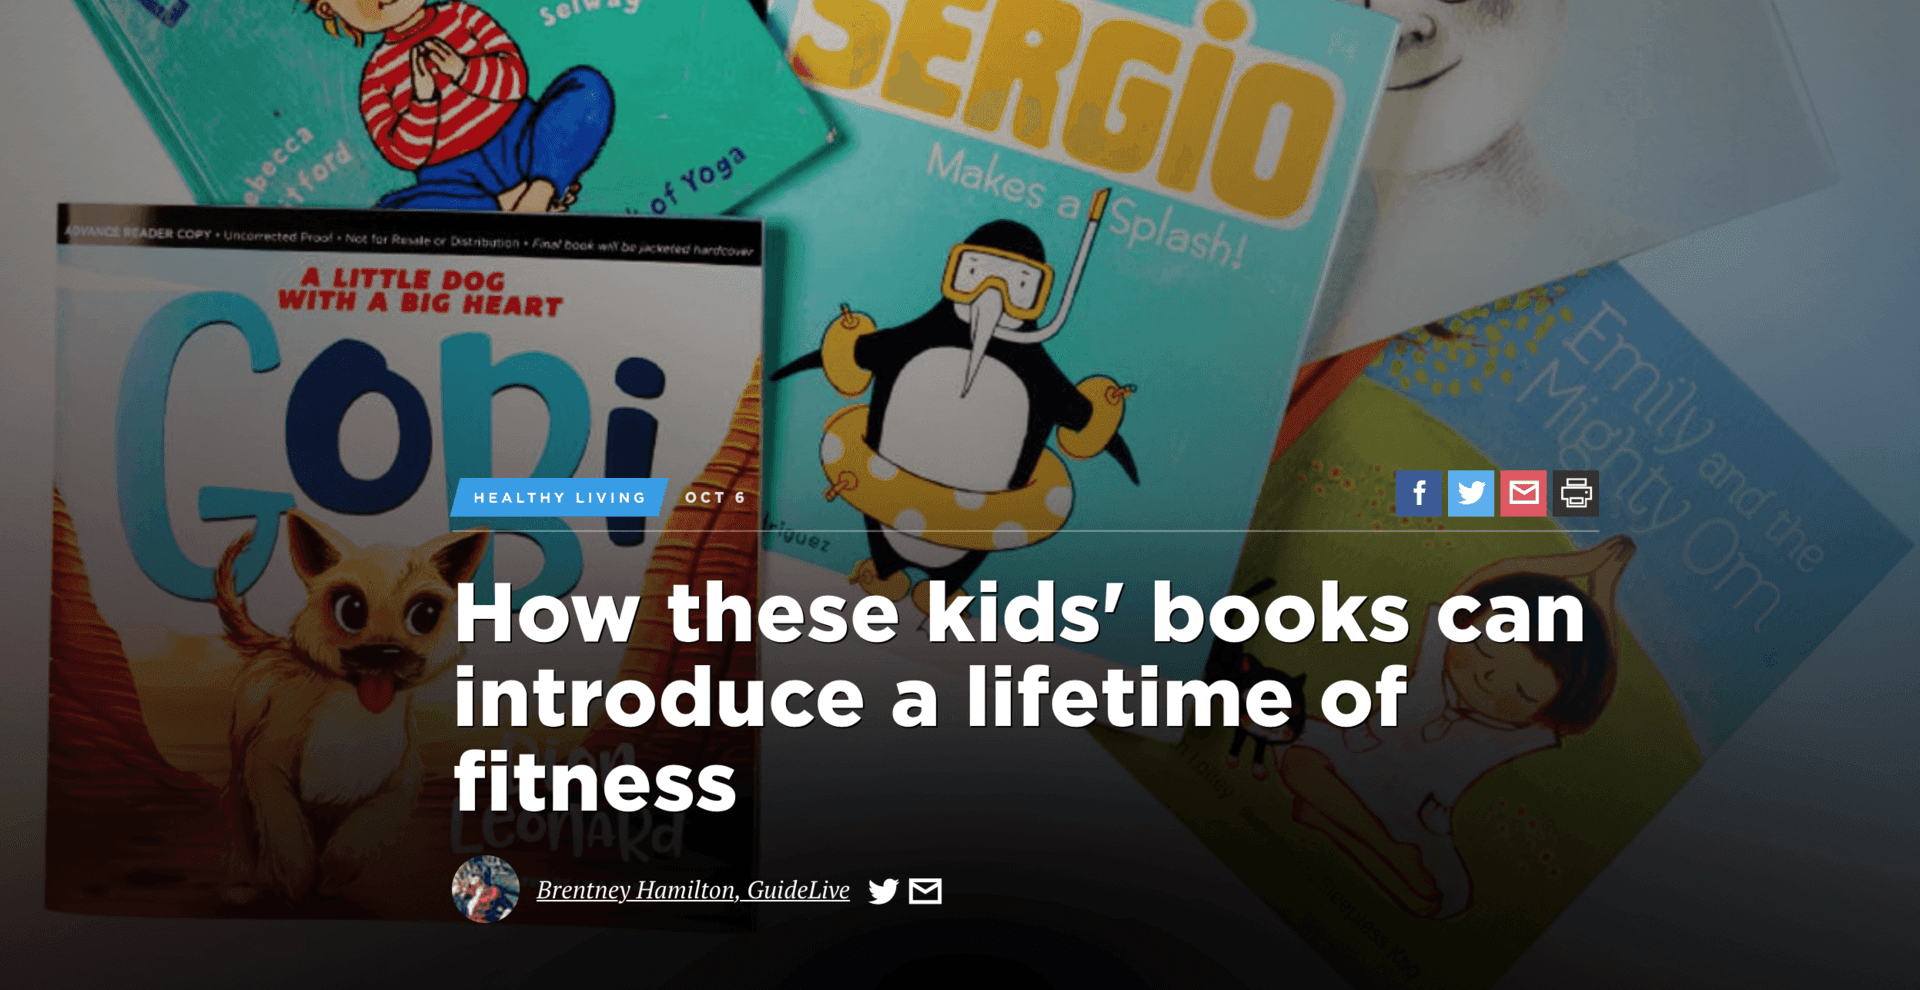 Finding Gobi, Dallas News, Dion Leonard, Children's Fitness